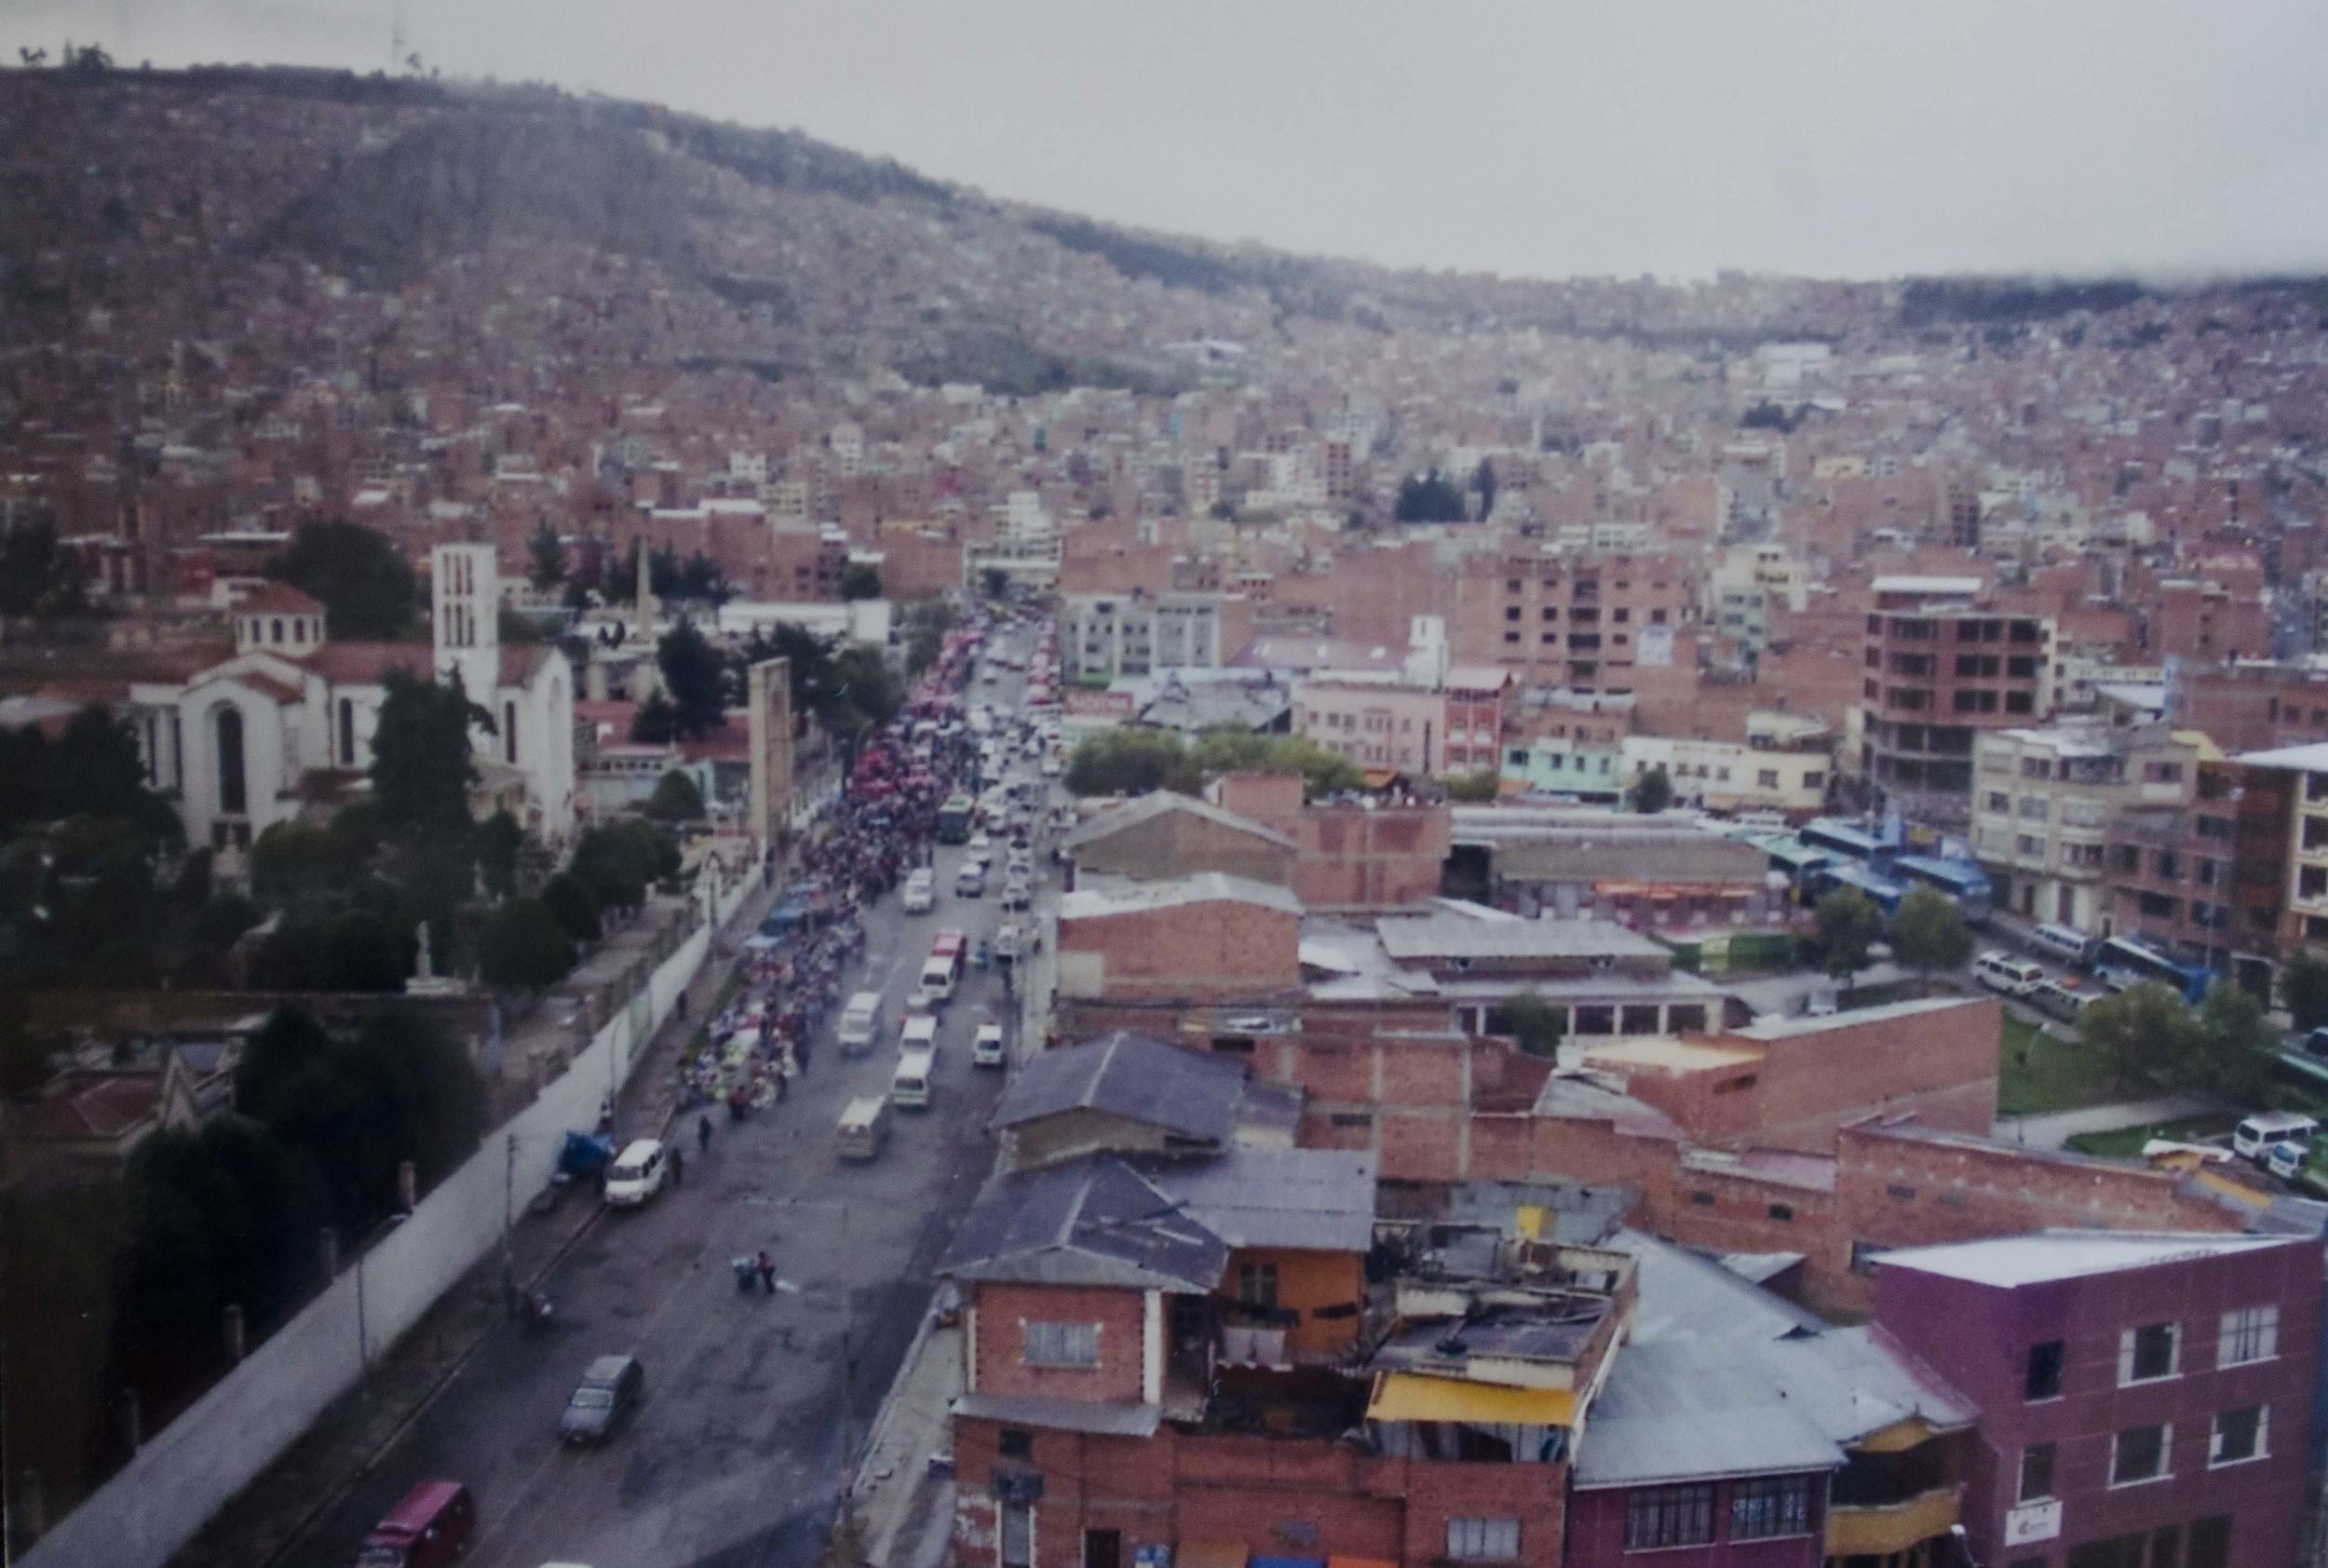 la paz, bolivia // january 2015